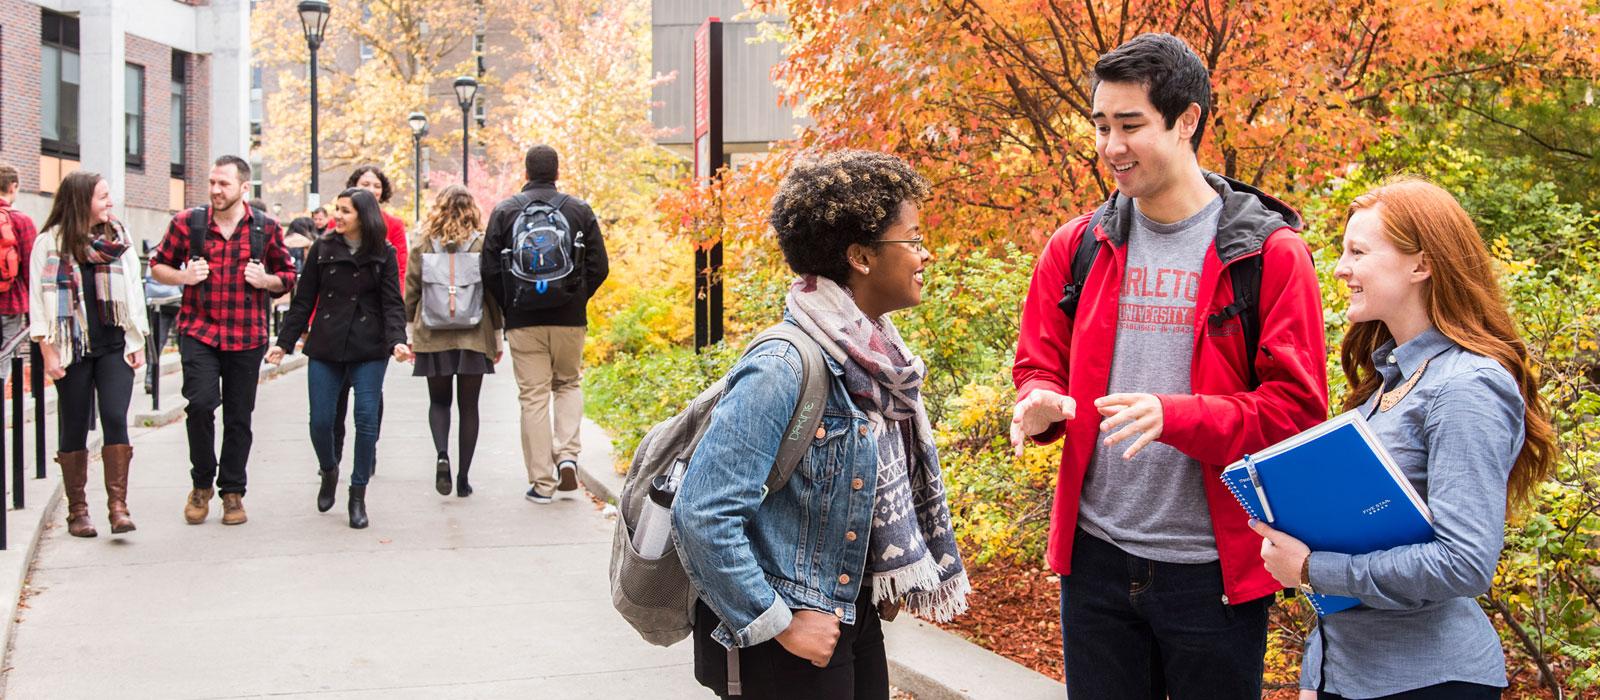 Carleton University students chatting and walking